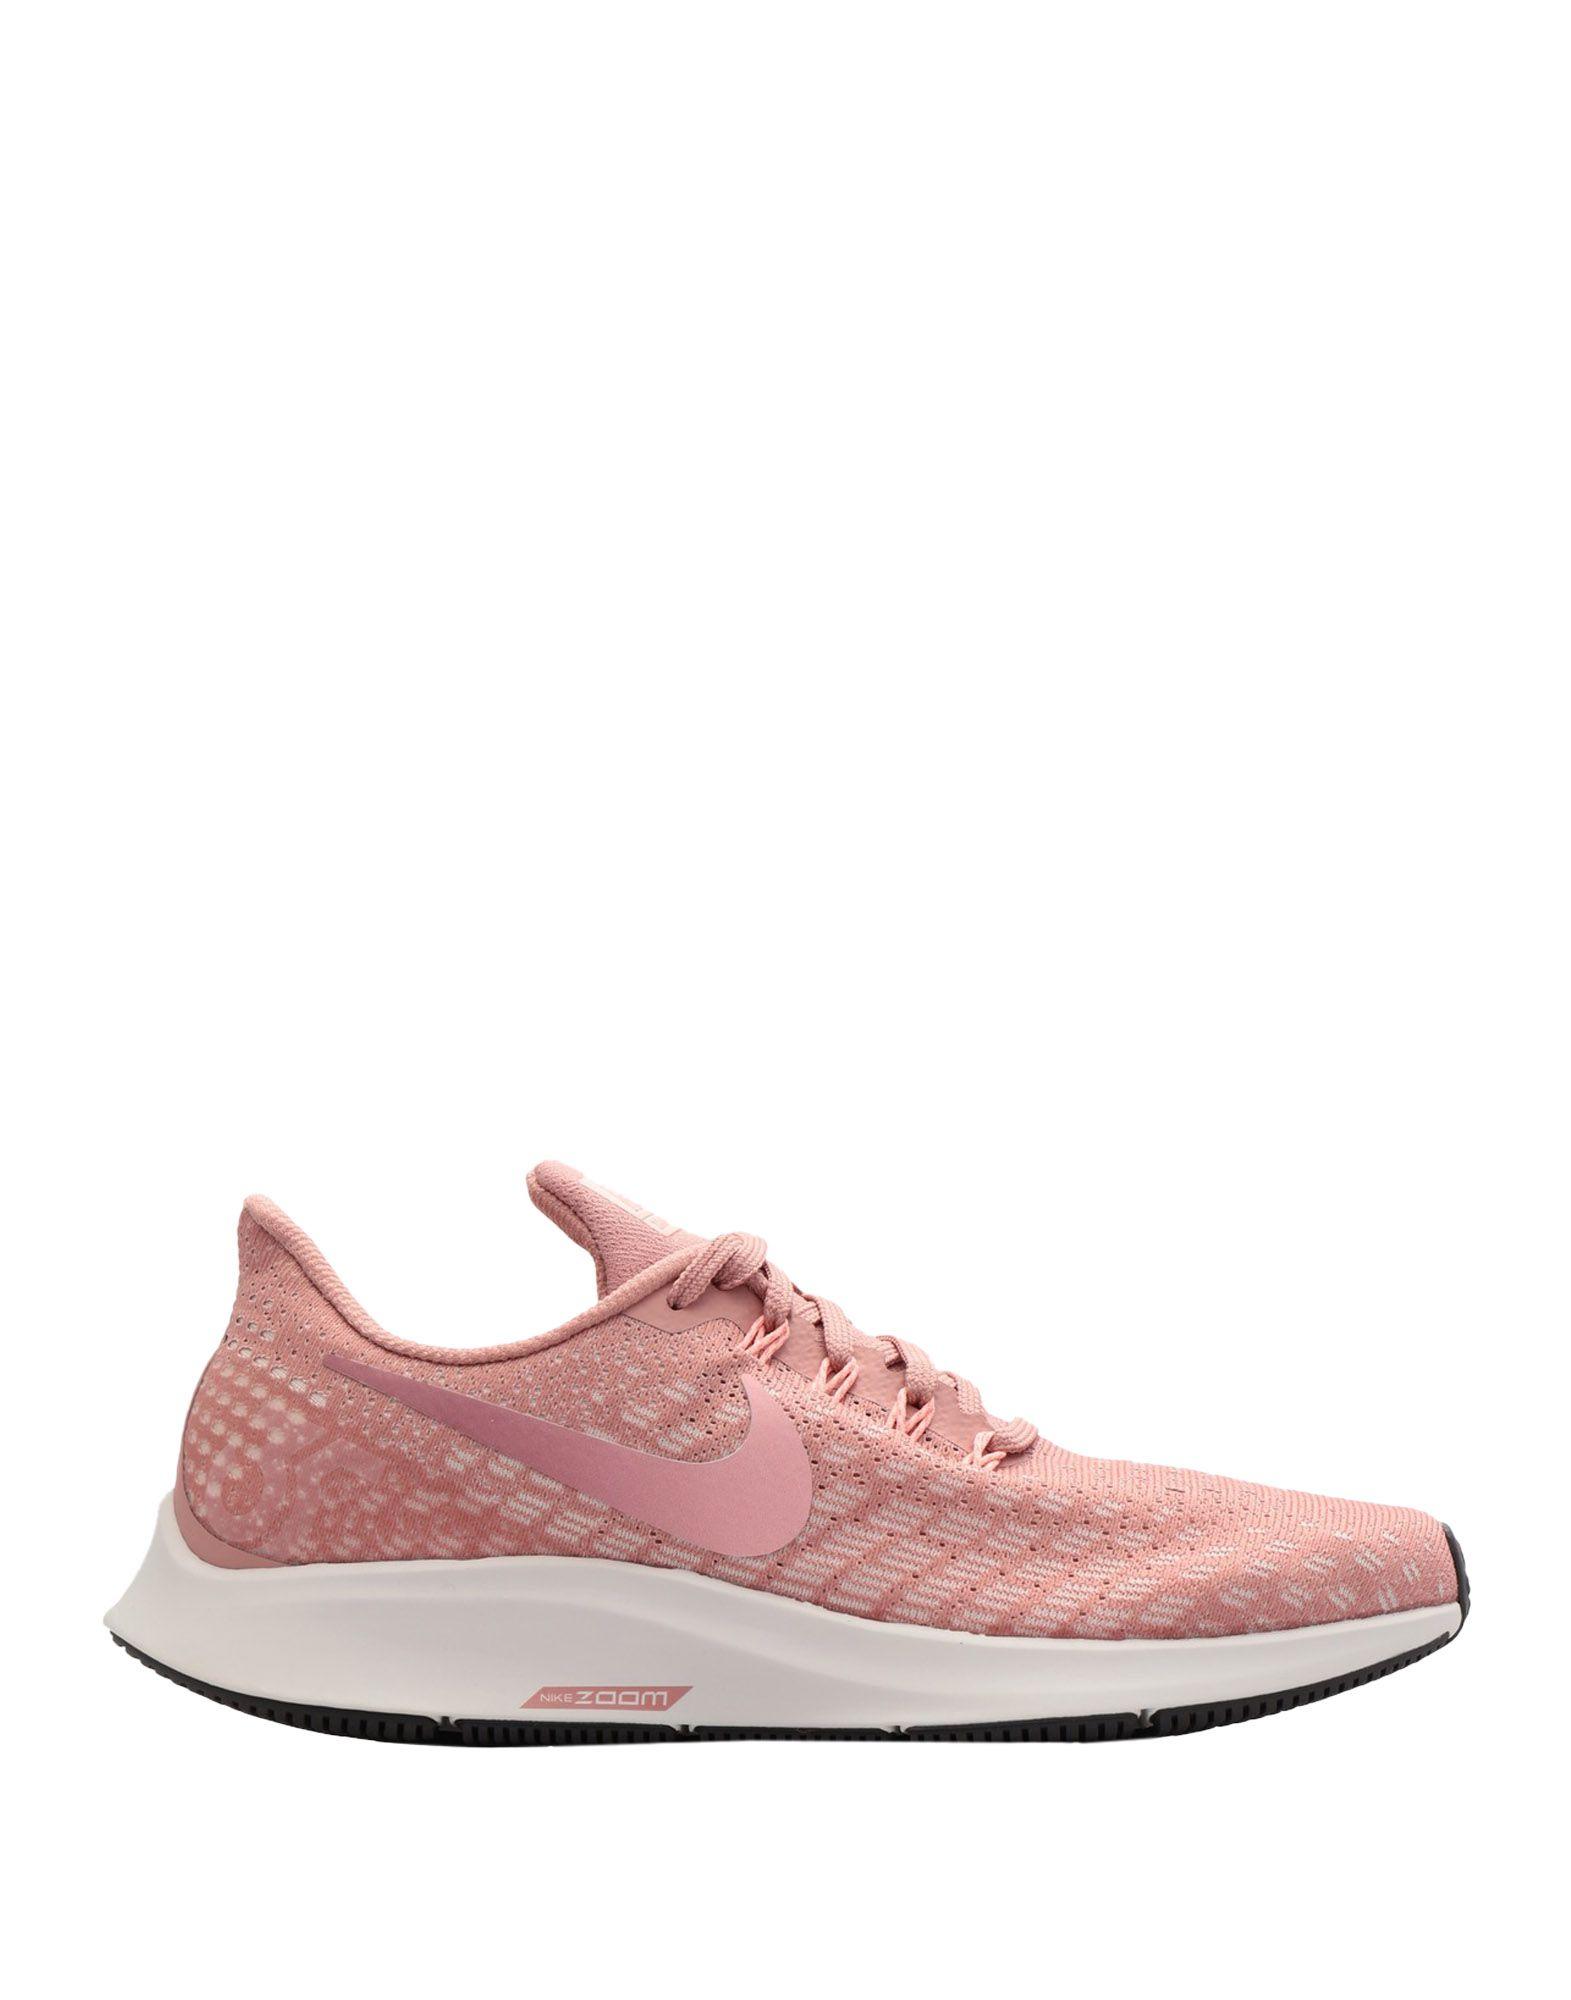 Zapatillas Nike Air Zoom Pegasus 35 - - Mujer - - Zapatillas Nike  Rosa pastel 6da4f3